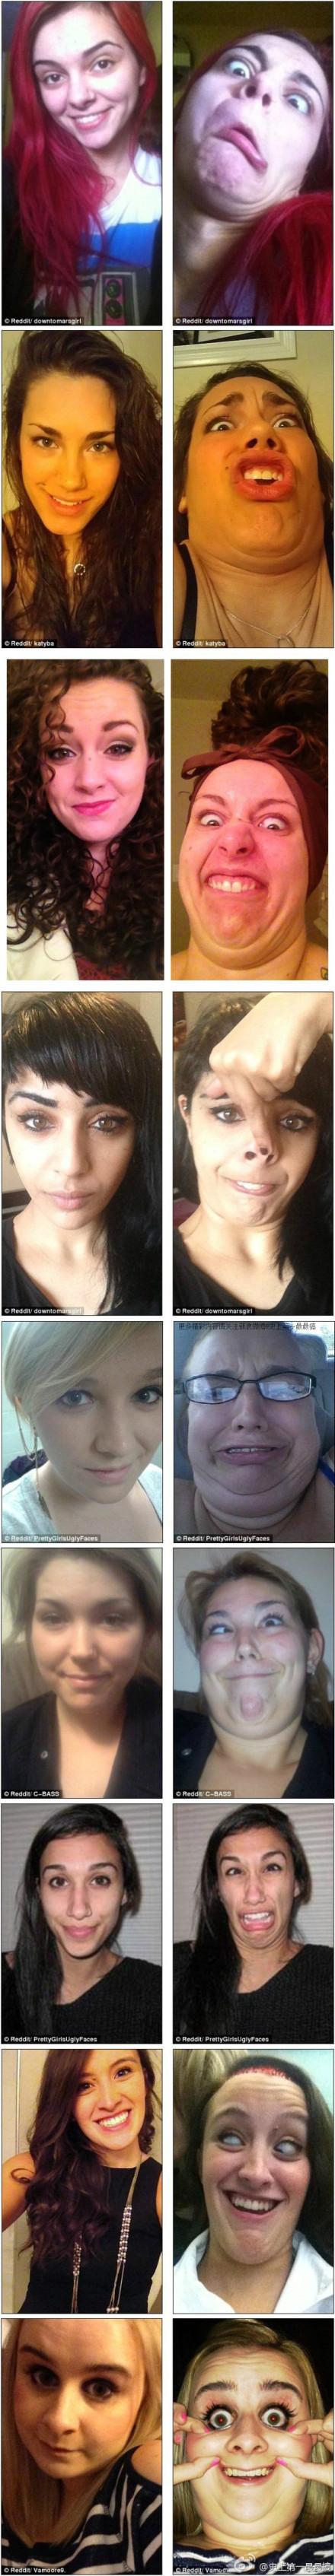 【Reddit上热门活动之一:漂亮姑娘做鬼脸】这是最近Reddit上的一个热门活动,就是妹纸们自己发一张自己正常的照片,然后发一张鬼脸照片,以最惨不忍睹最佳。于是,美帝的姑娘们拼了。。。(转)